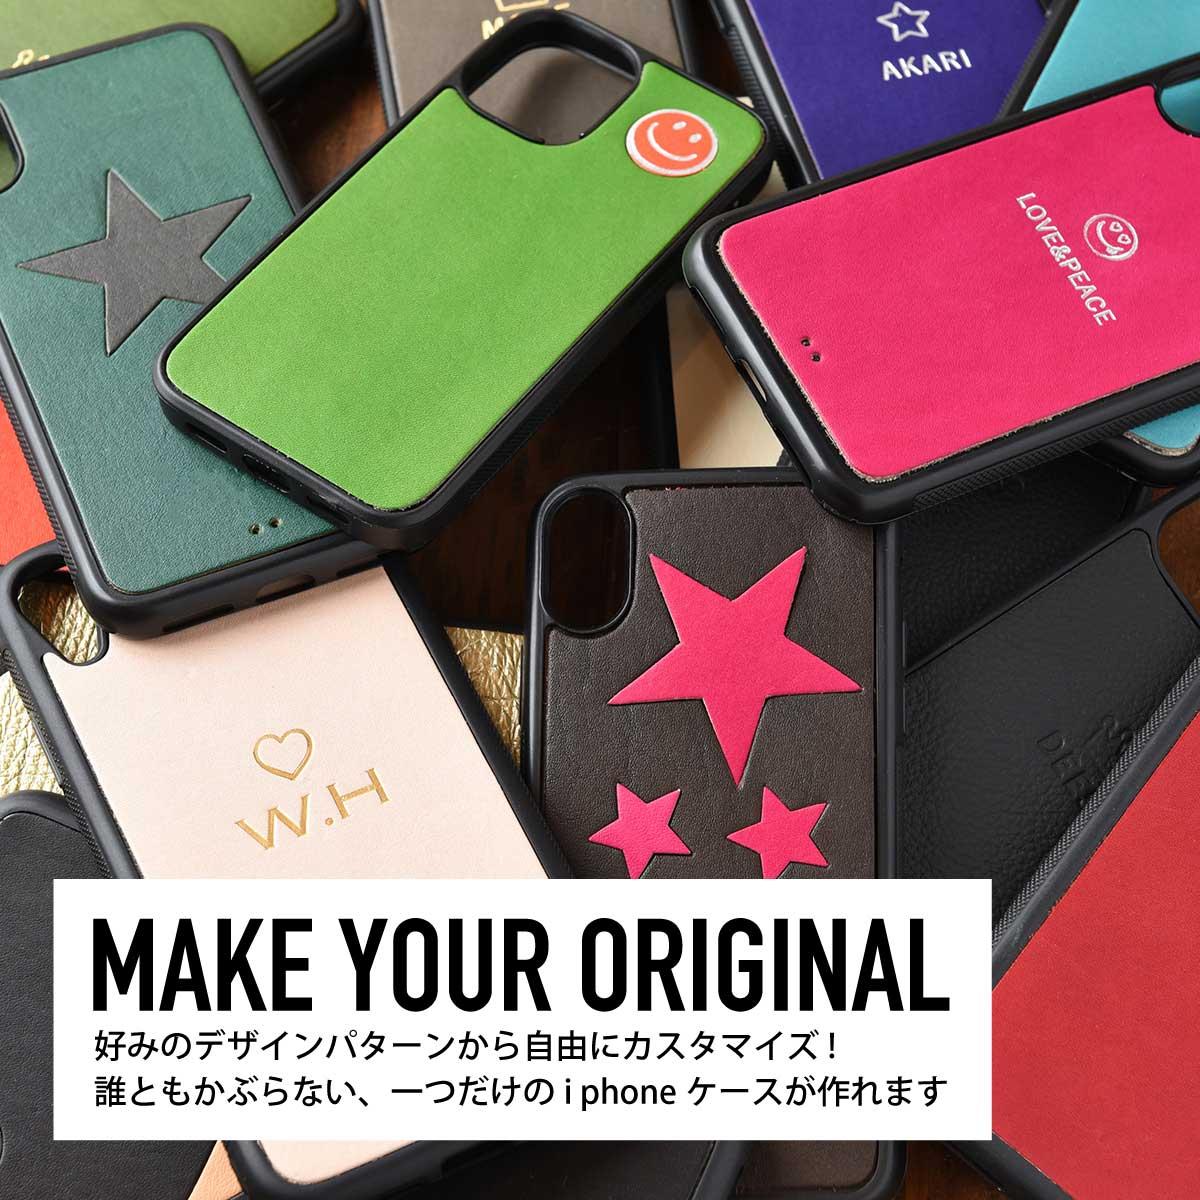 iPhoneOpenCase:   Design E_5:ミニマーク刻印(ハート)+名入れ